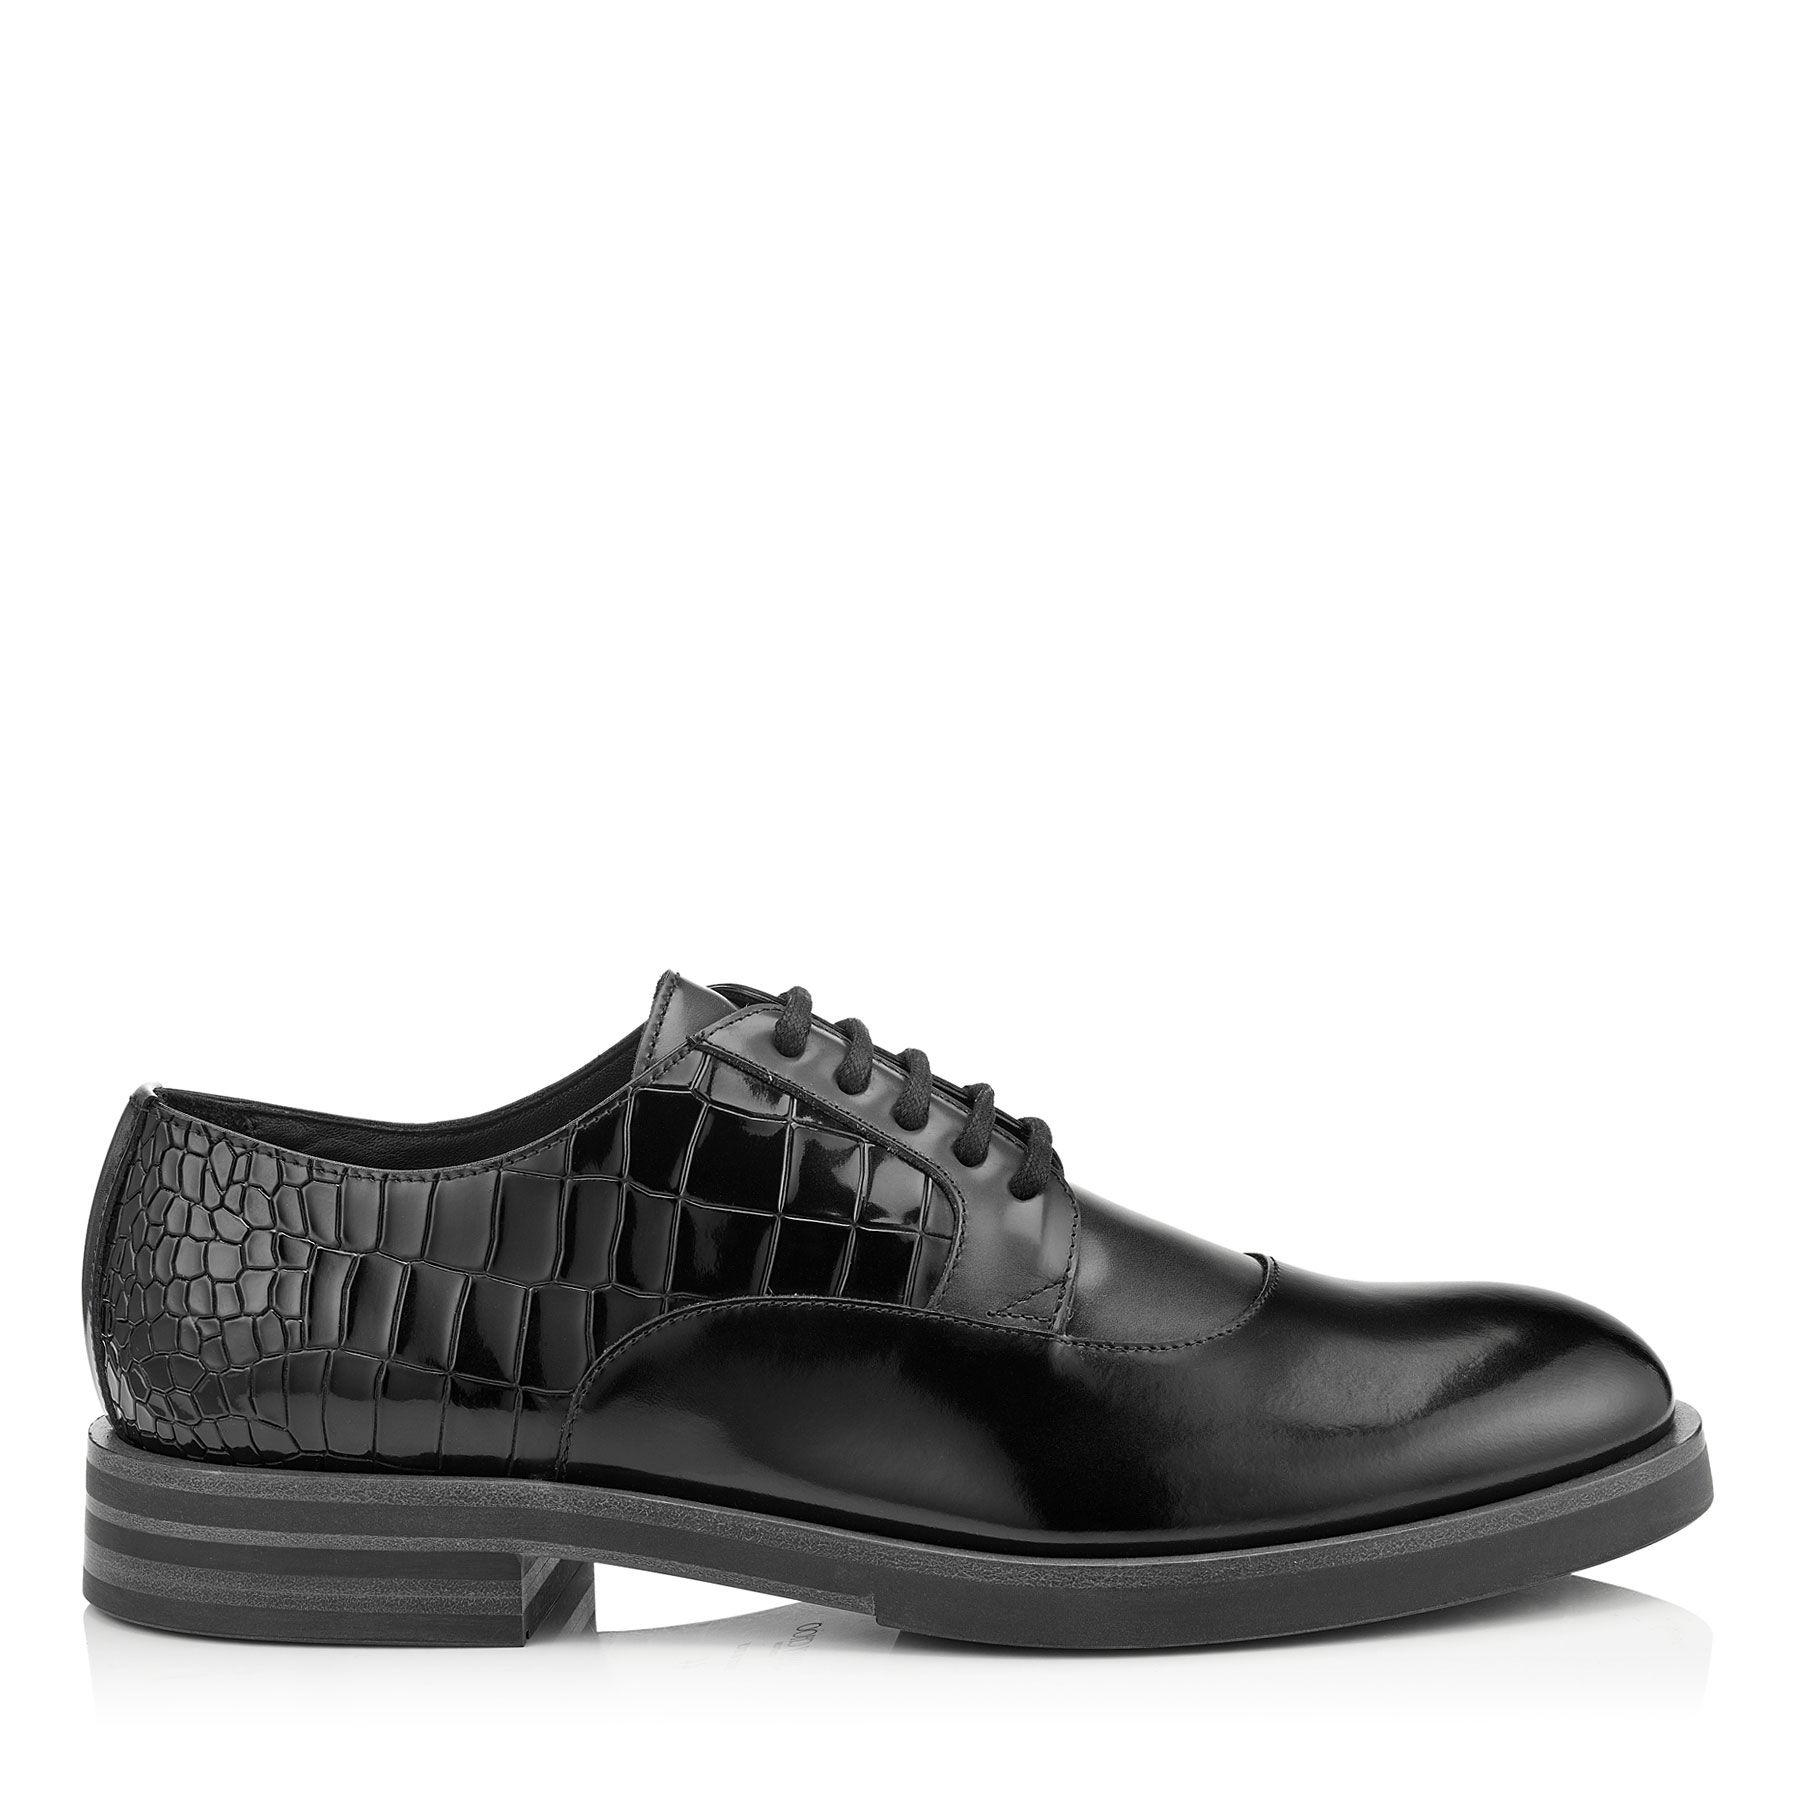 Bolan shoes - Black Jimmy Choo London NZXXWKJ